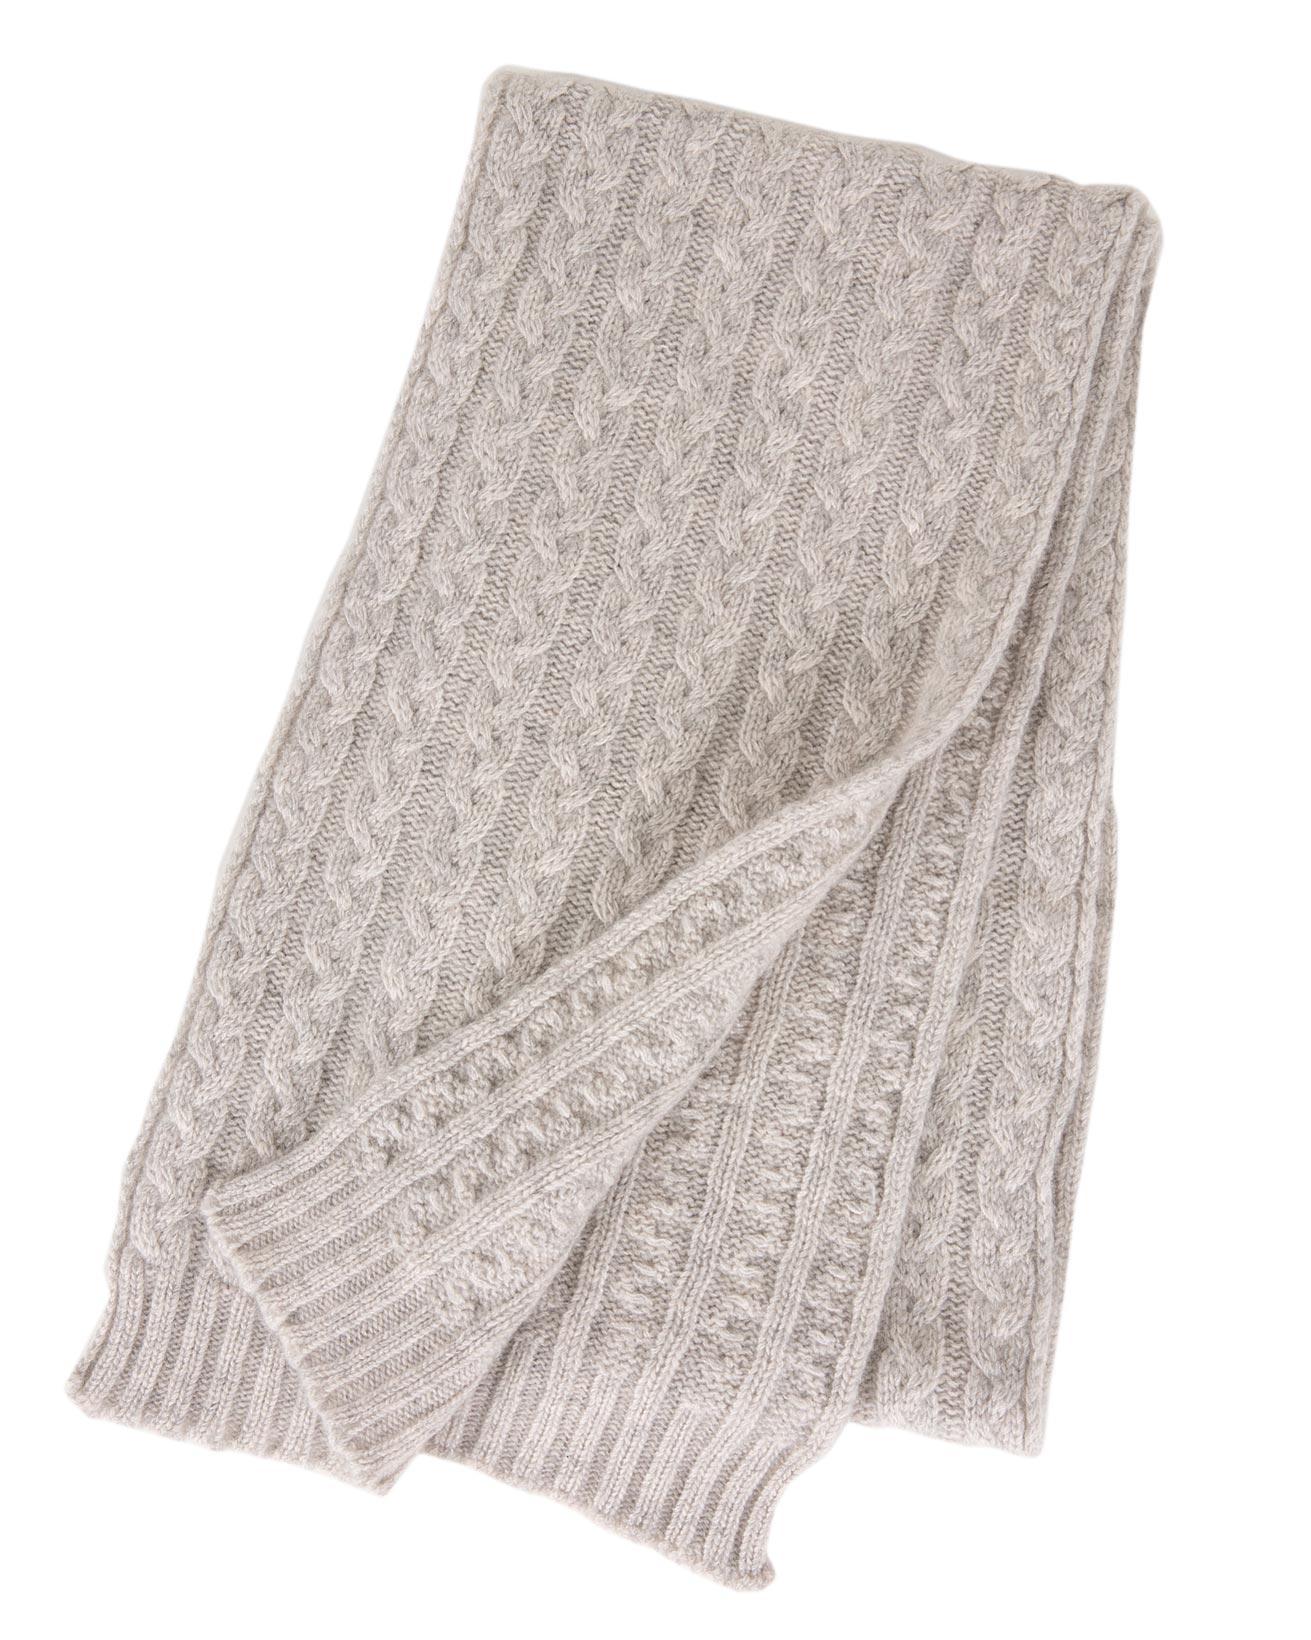 7529-statement scarf-dove grey scarf.jpg